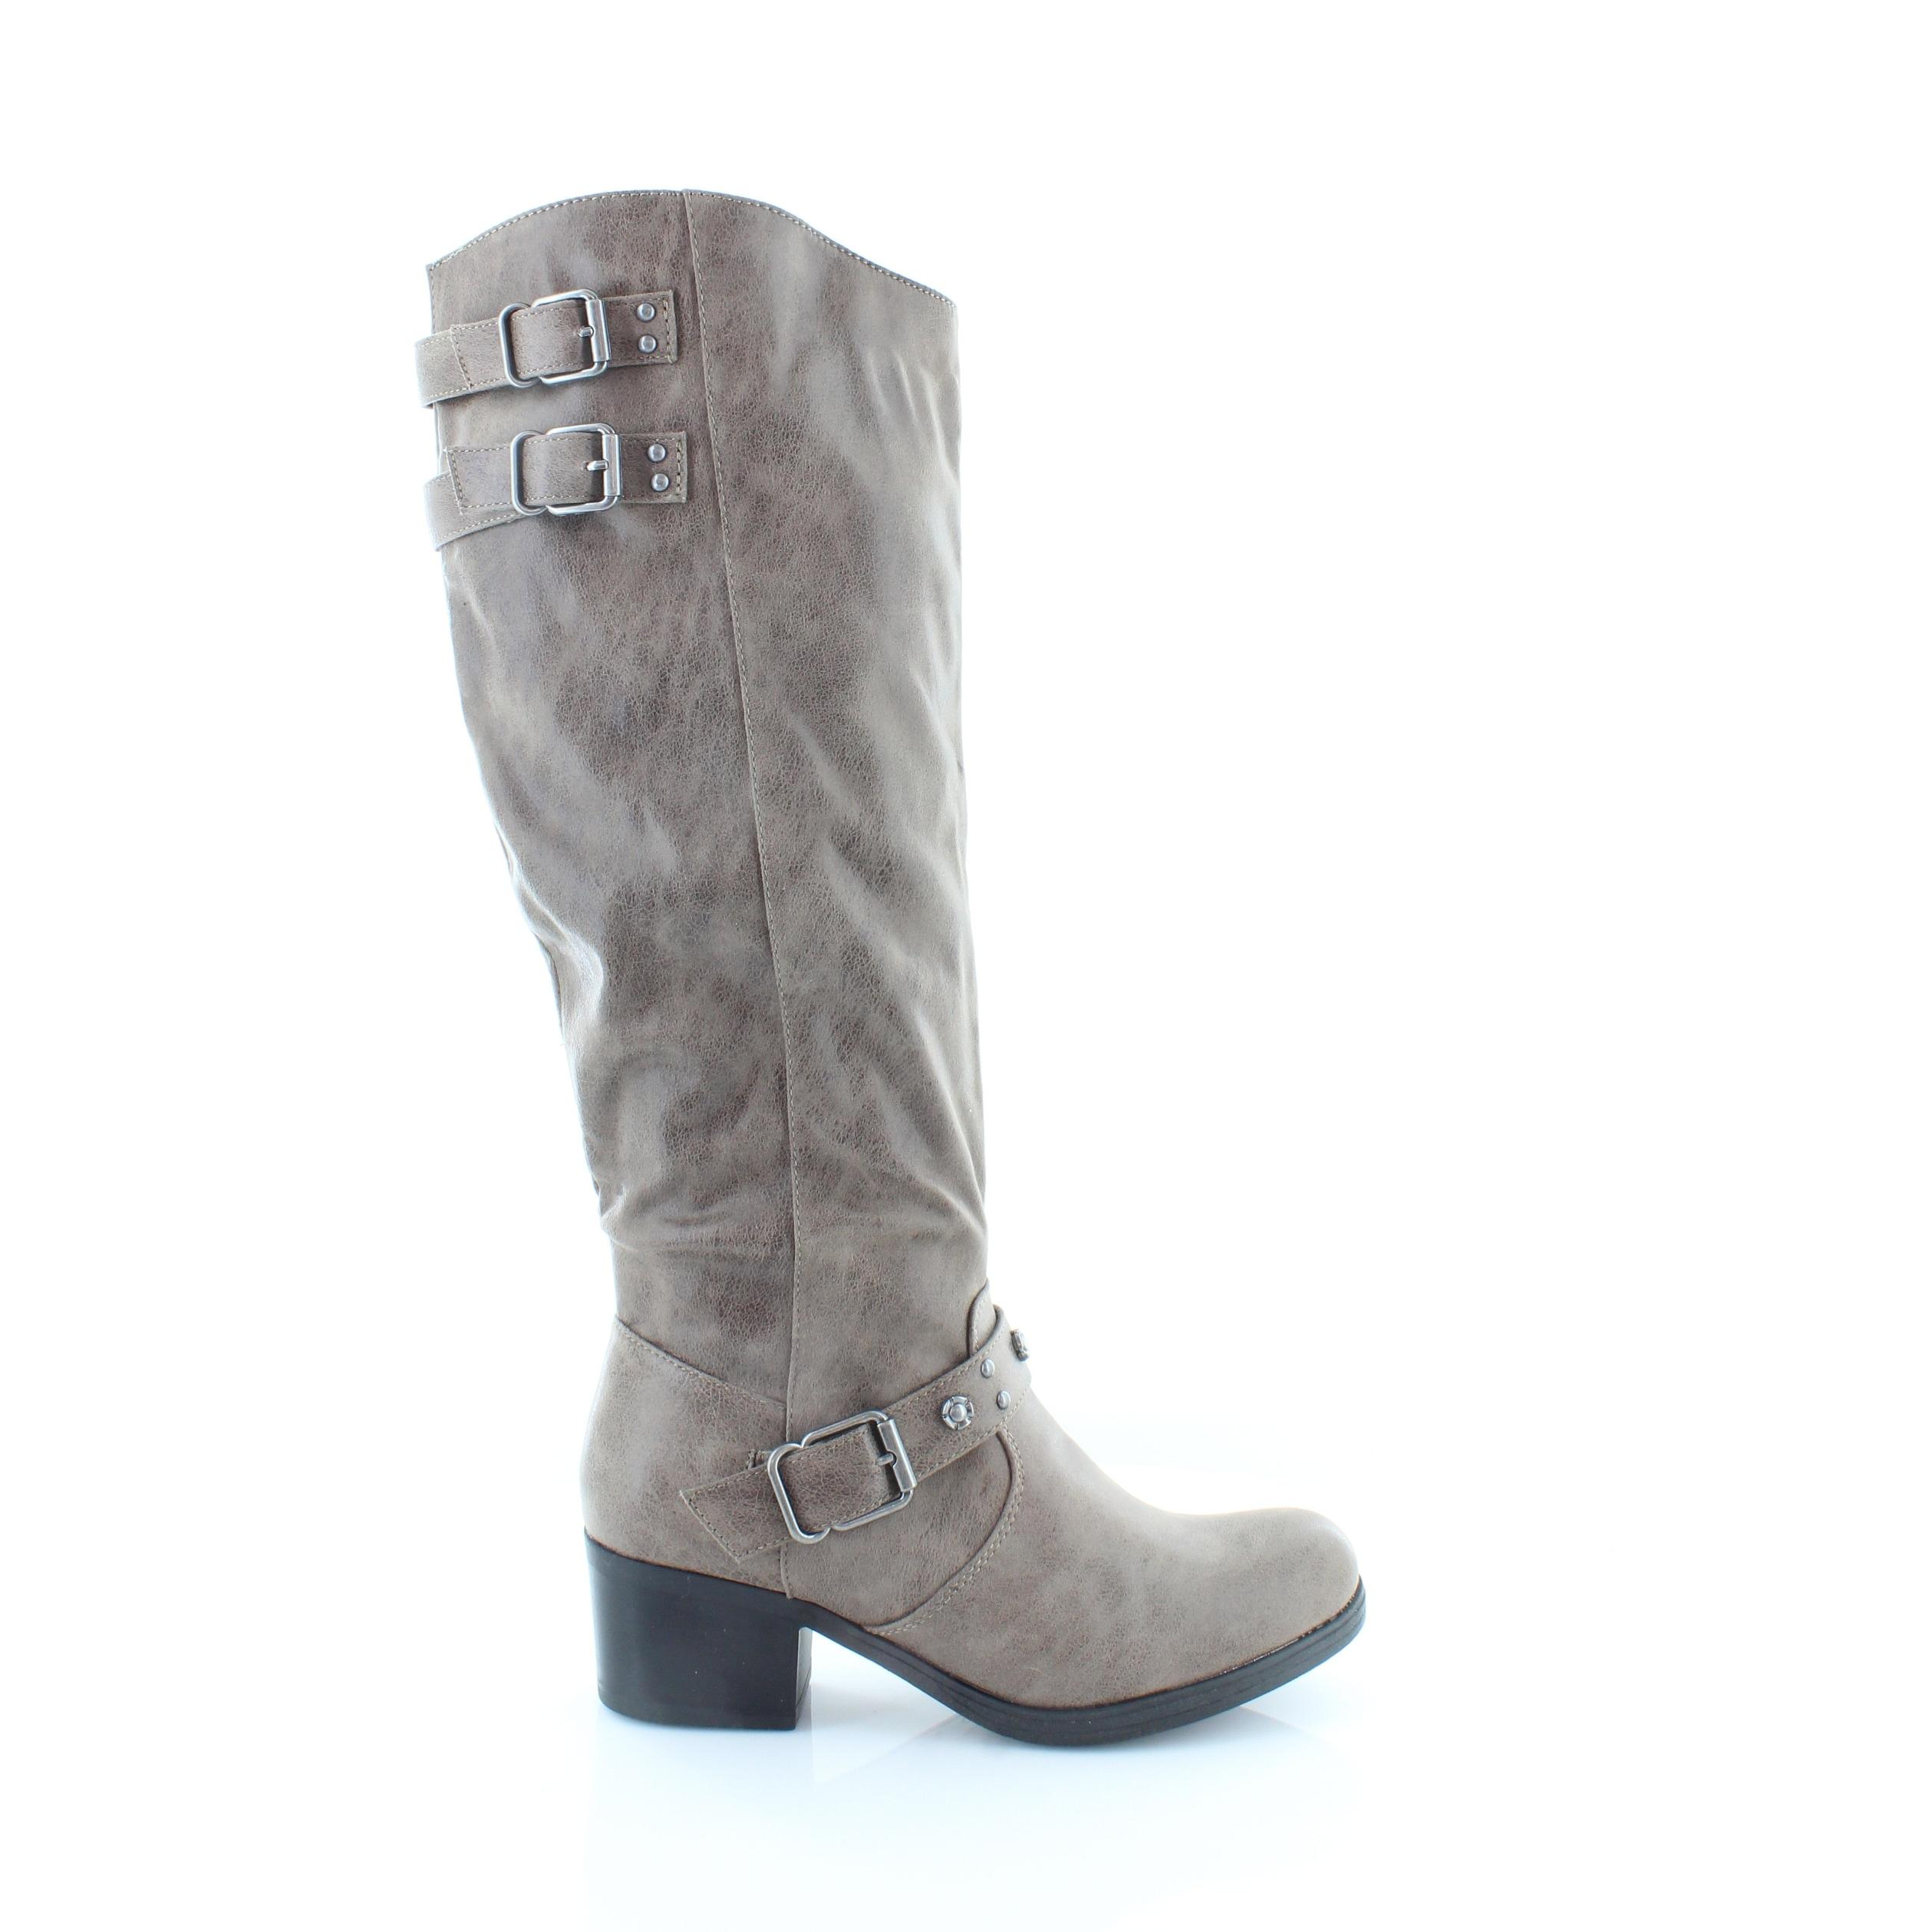 93959149ace Shop Carlos Santana Cara Women s Boots Taupe - Free Shipping Today ...